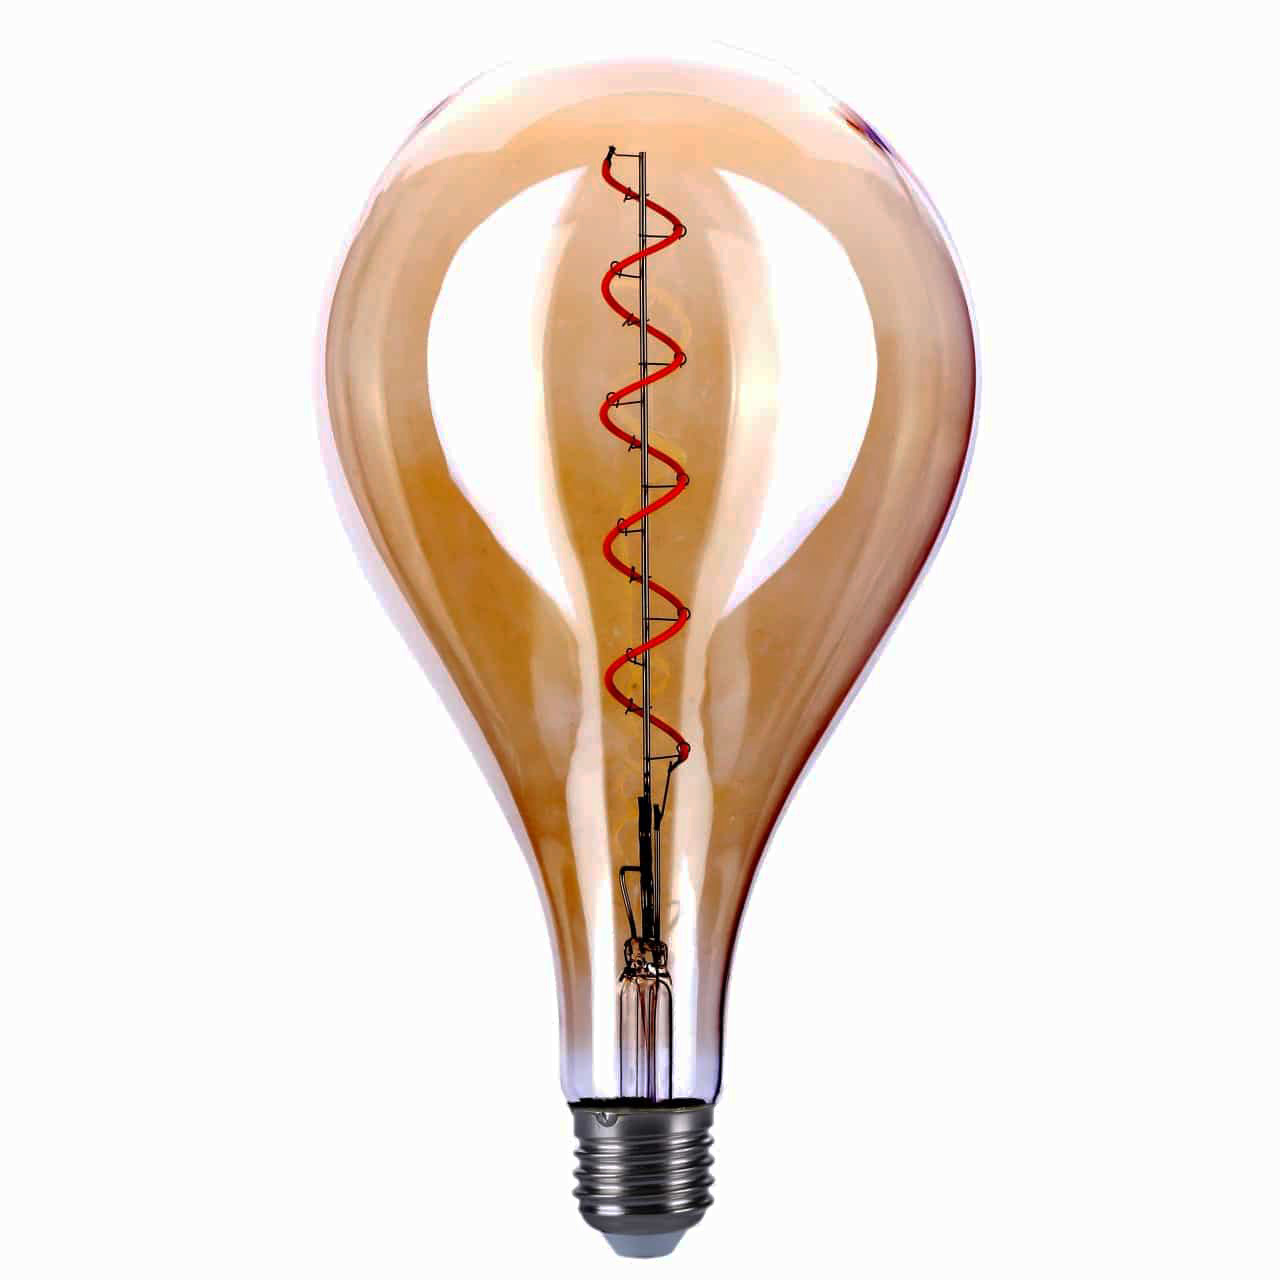 Highlight Lamp LED XXL Stand 16x28 cm 4W 100 LM 2200K DIM Gold